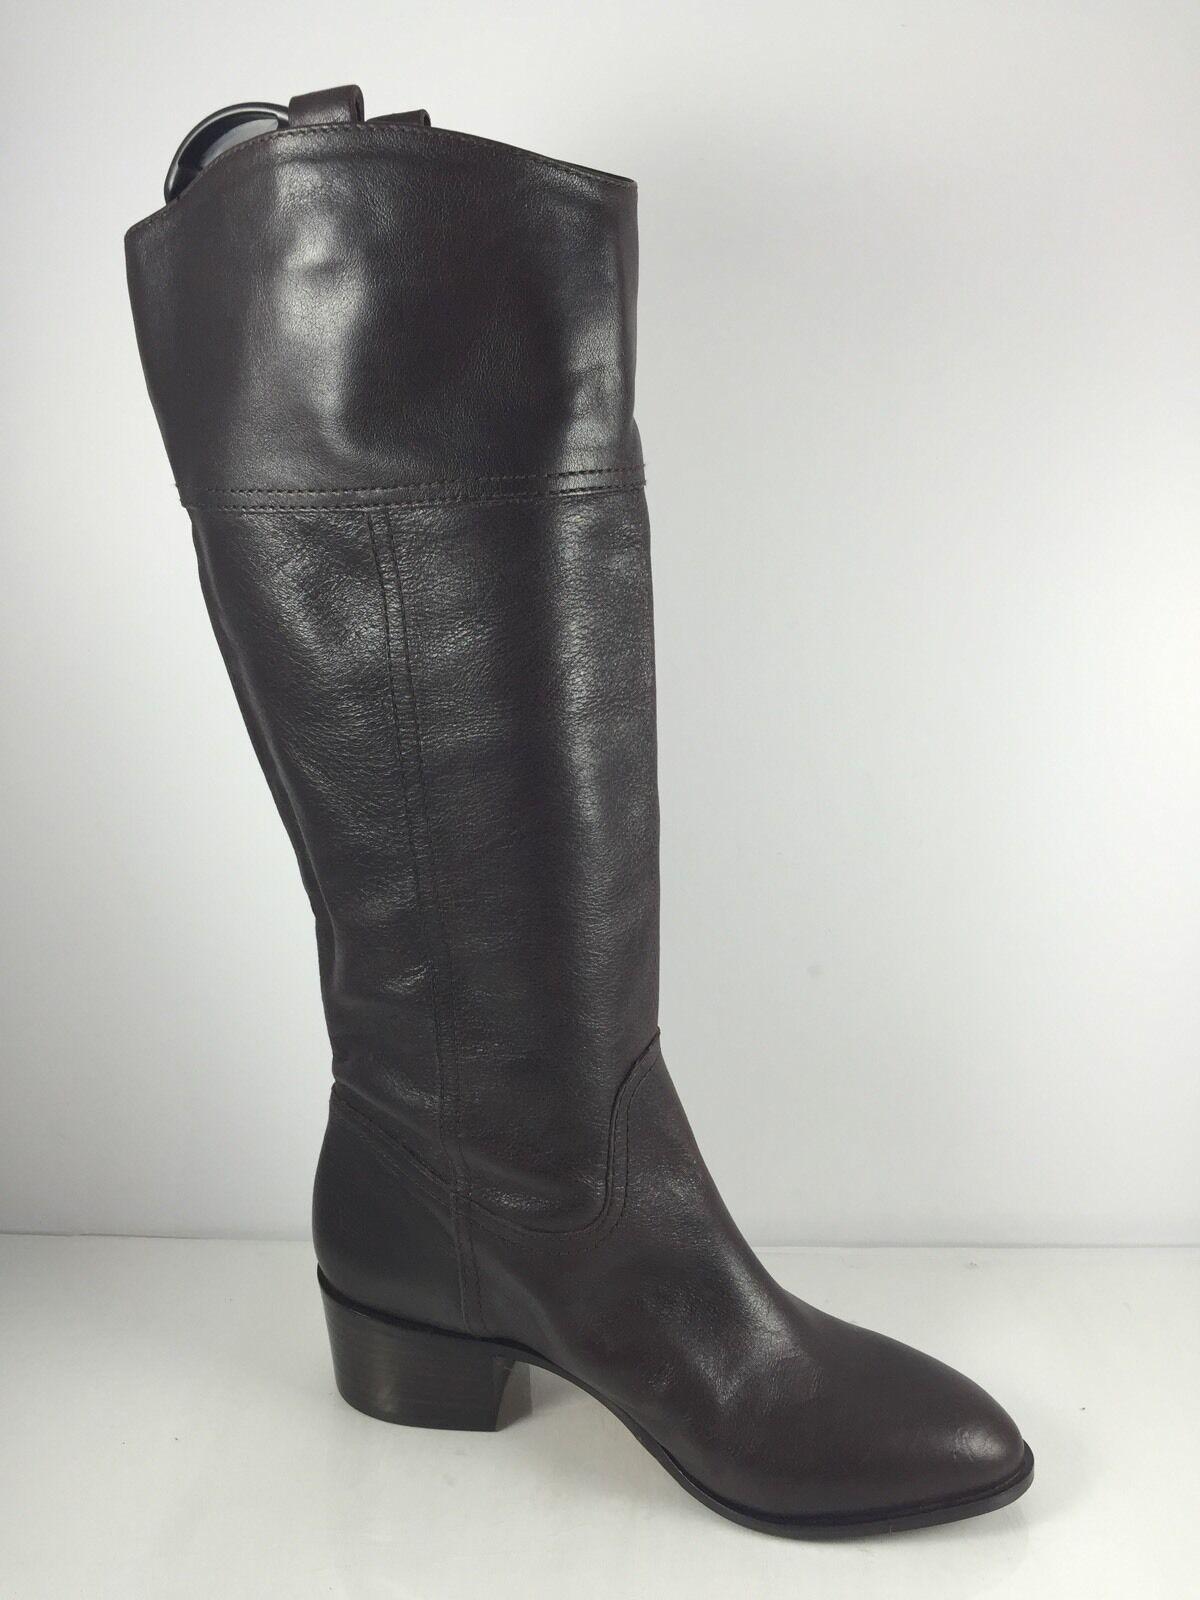 Louise Louise Louise et Cie Damenschuhe Braun Leder Stiefel 8.5 B b2c5fd